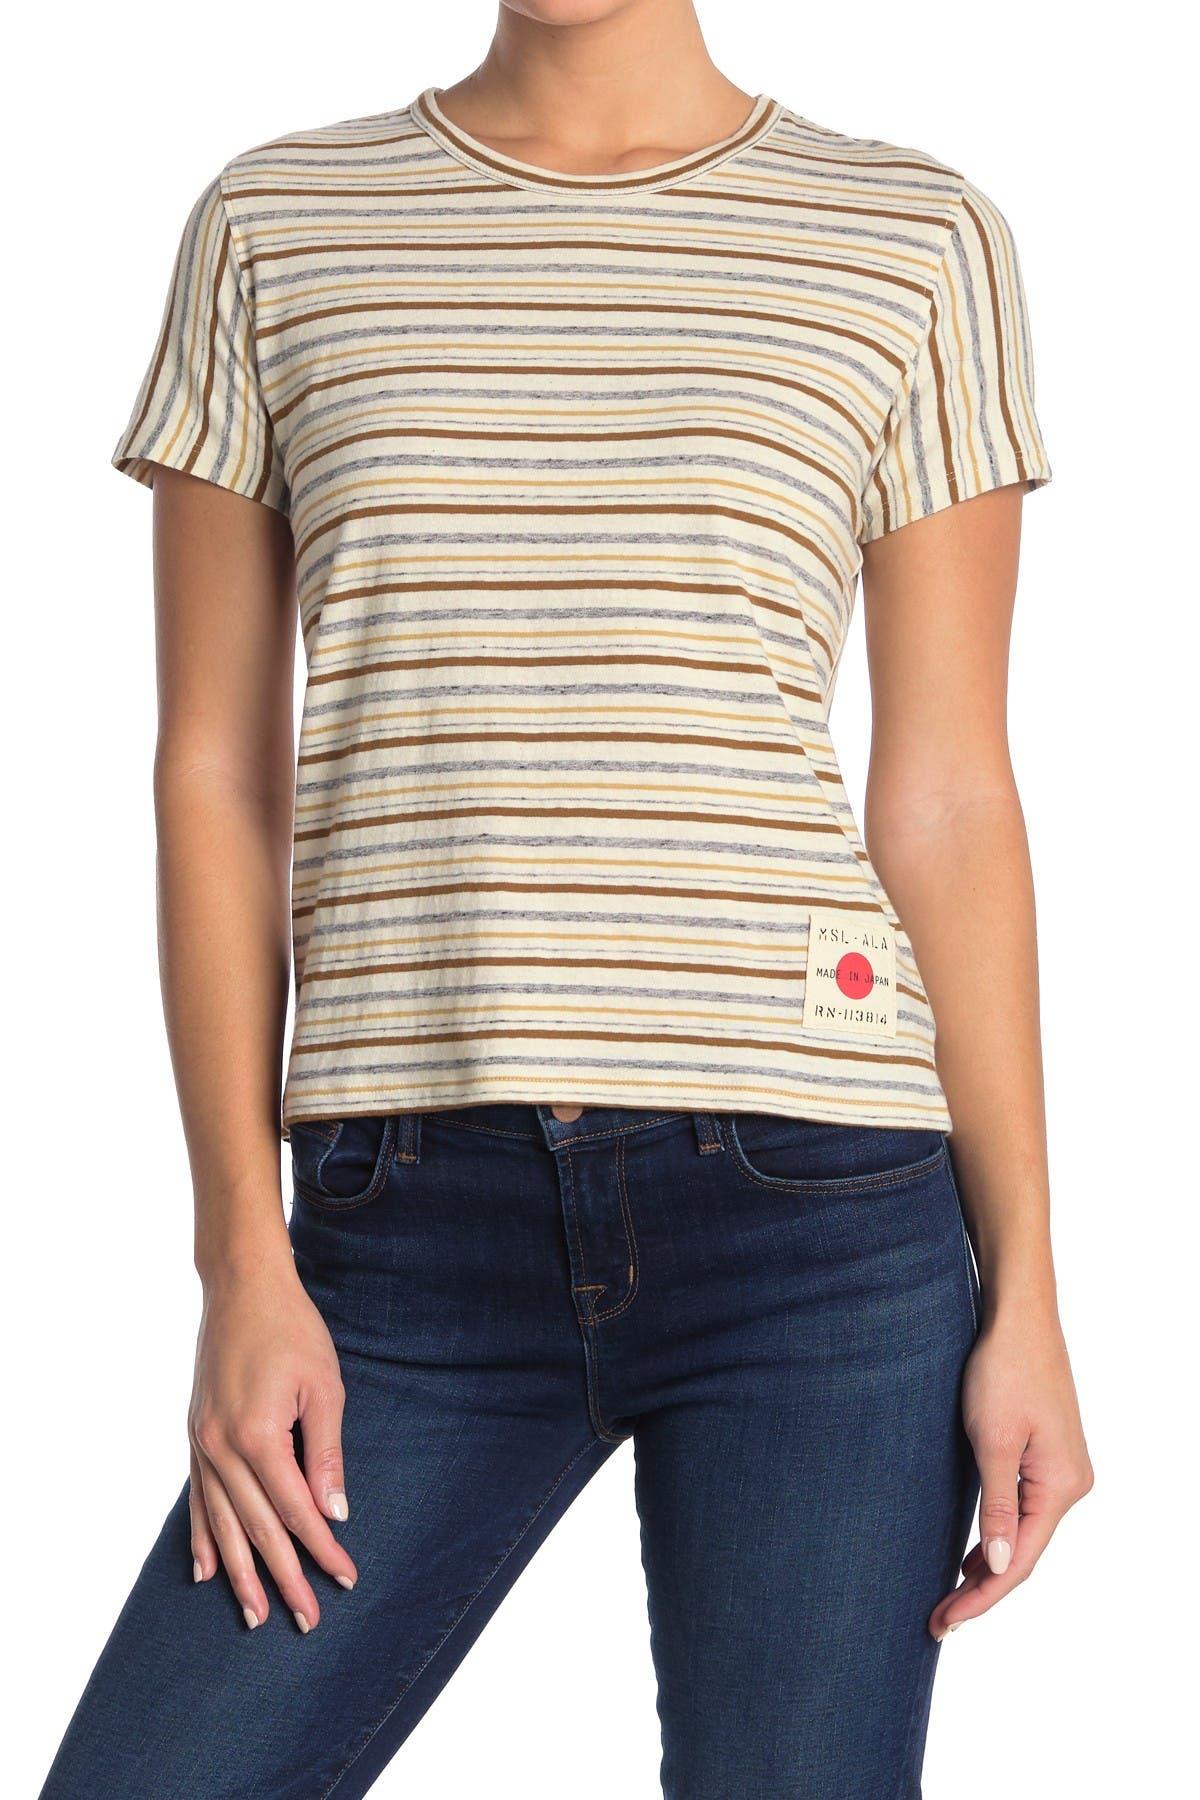 Image of Billy Reid Desert Tee Shirt